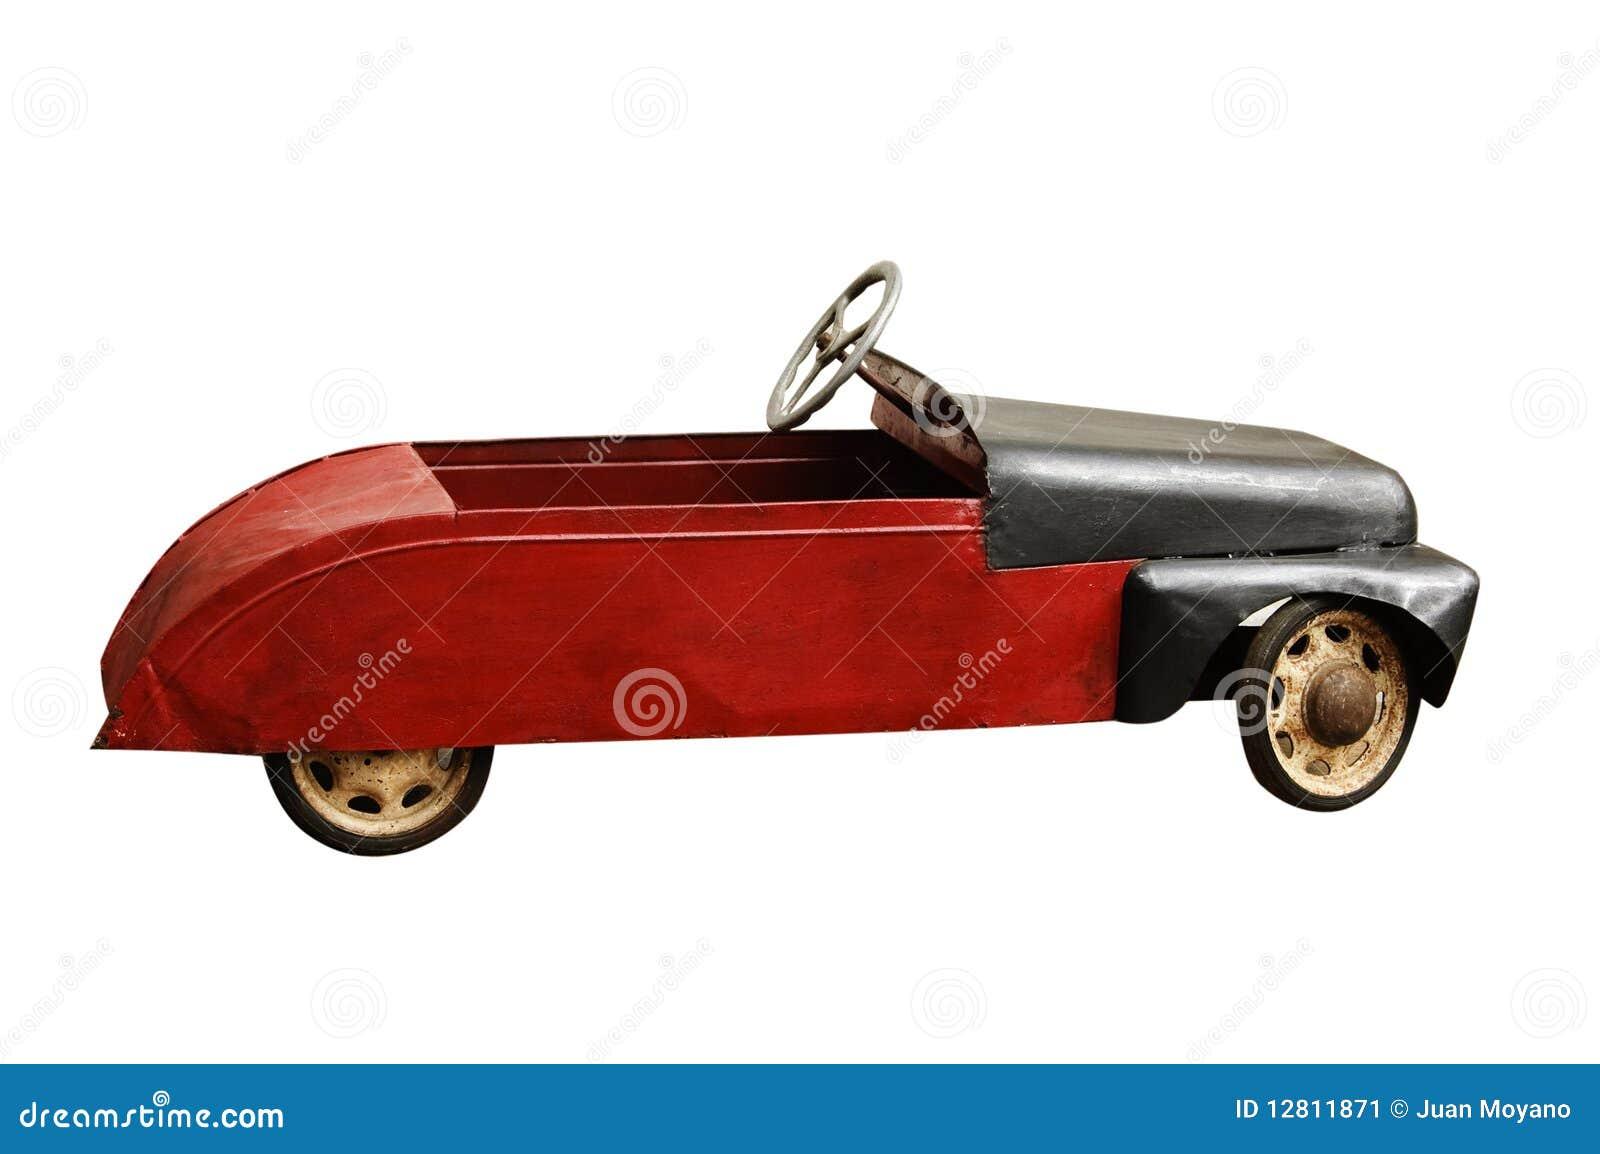 Antique Cars Toys 119